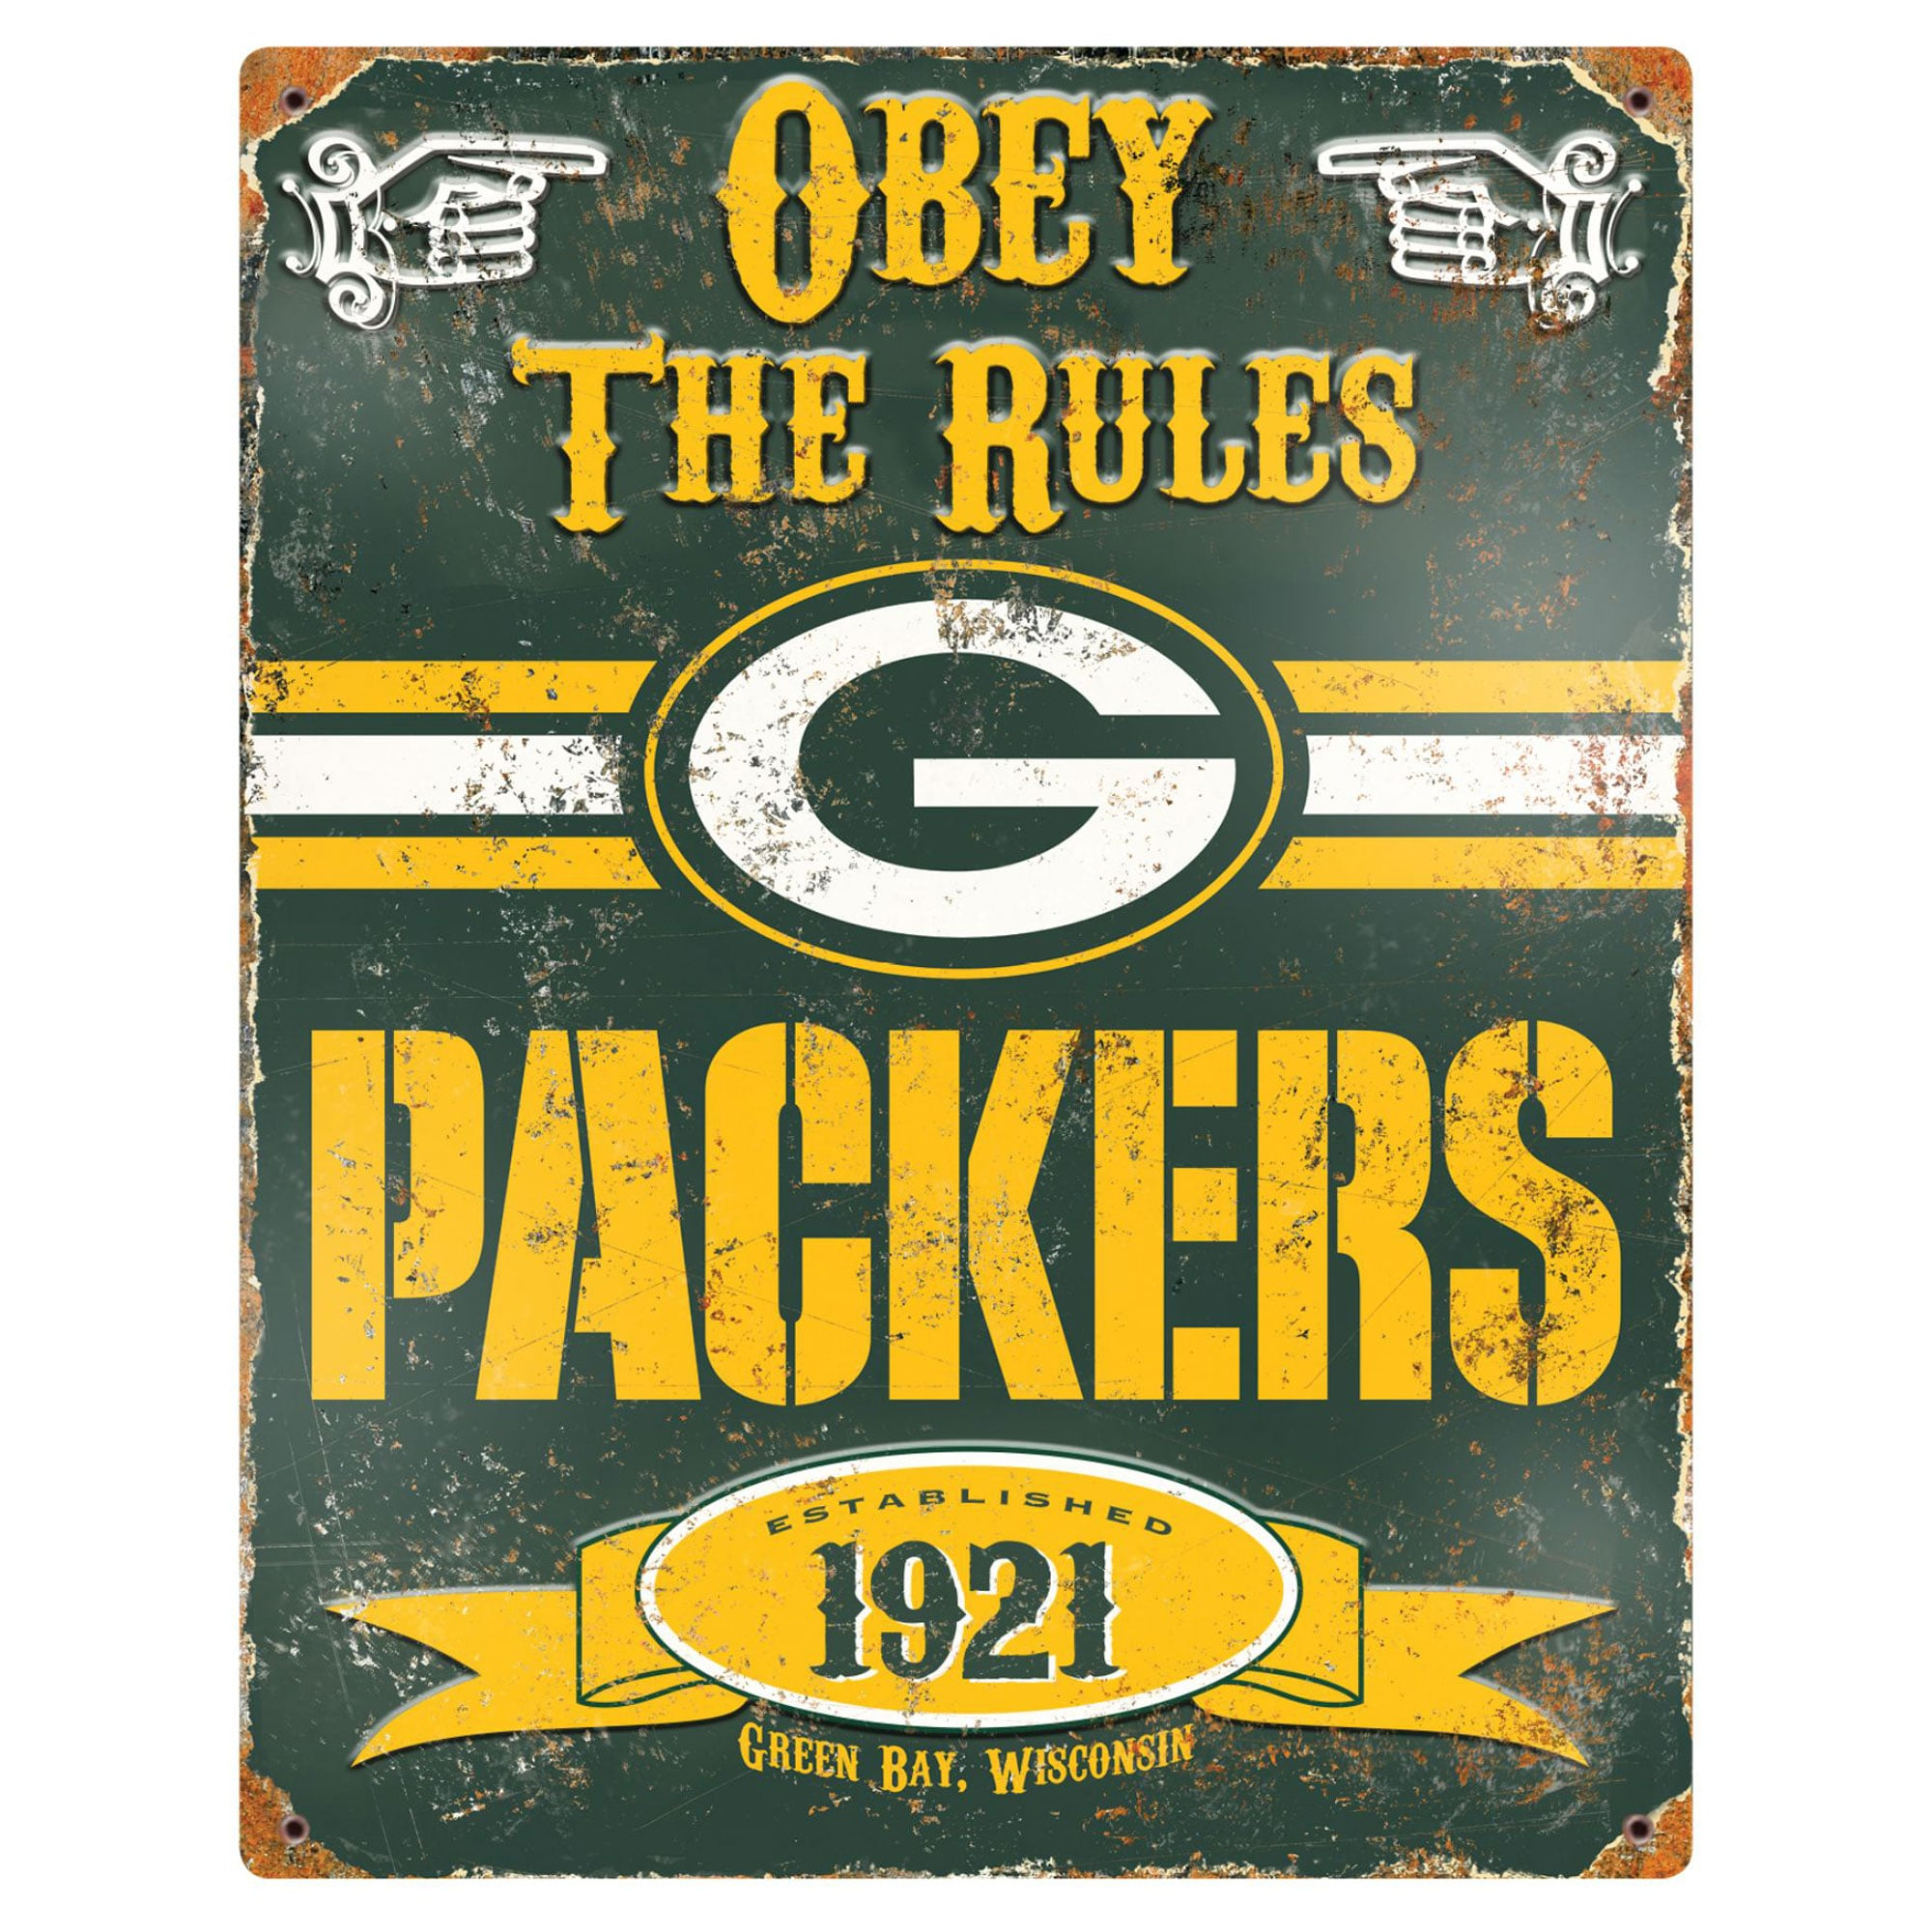 Green Bay Packers 14.5'' x 11.5'' Embossed Metal Sign